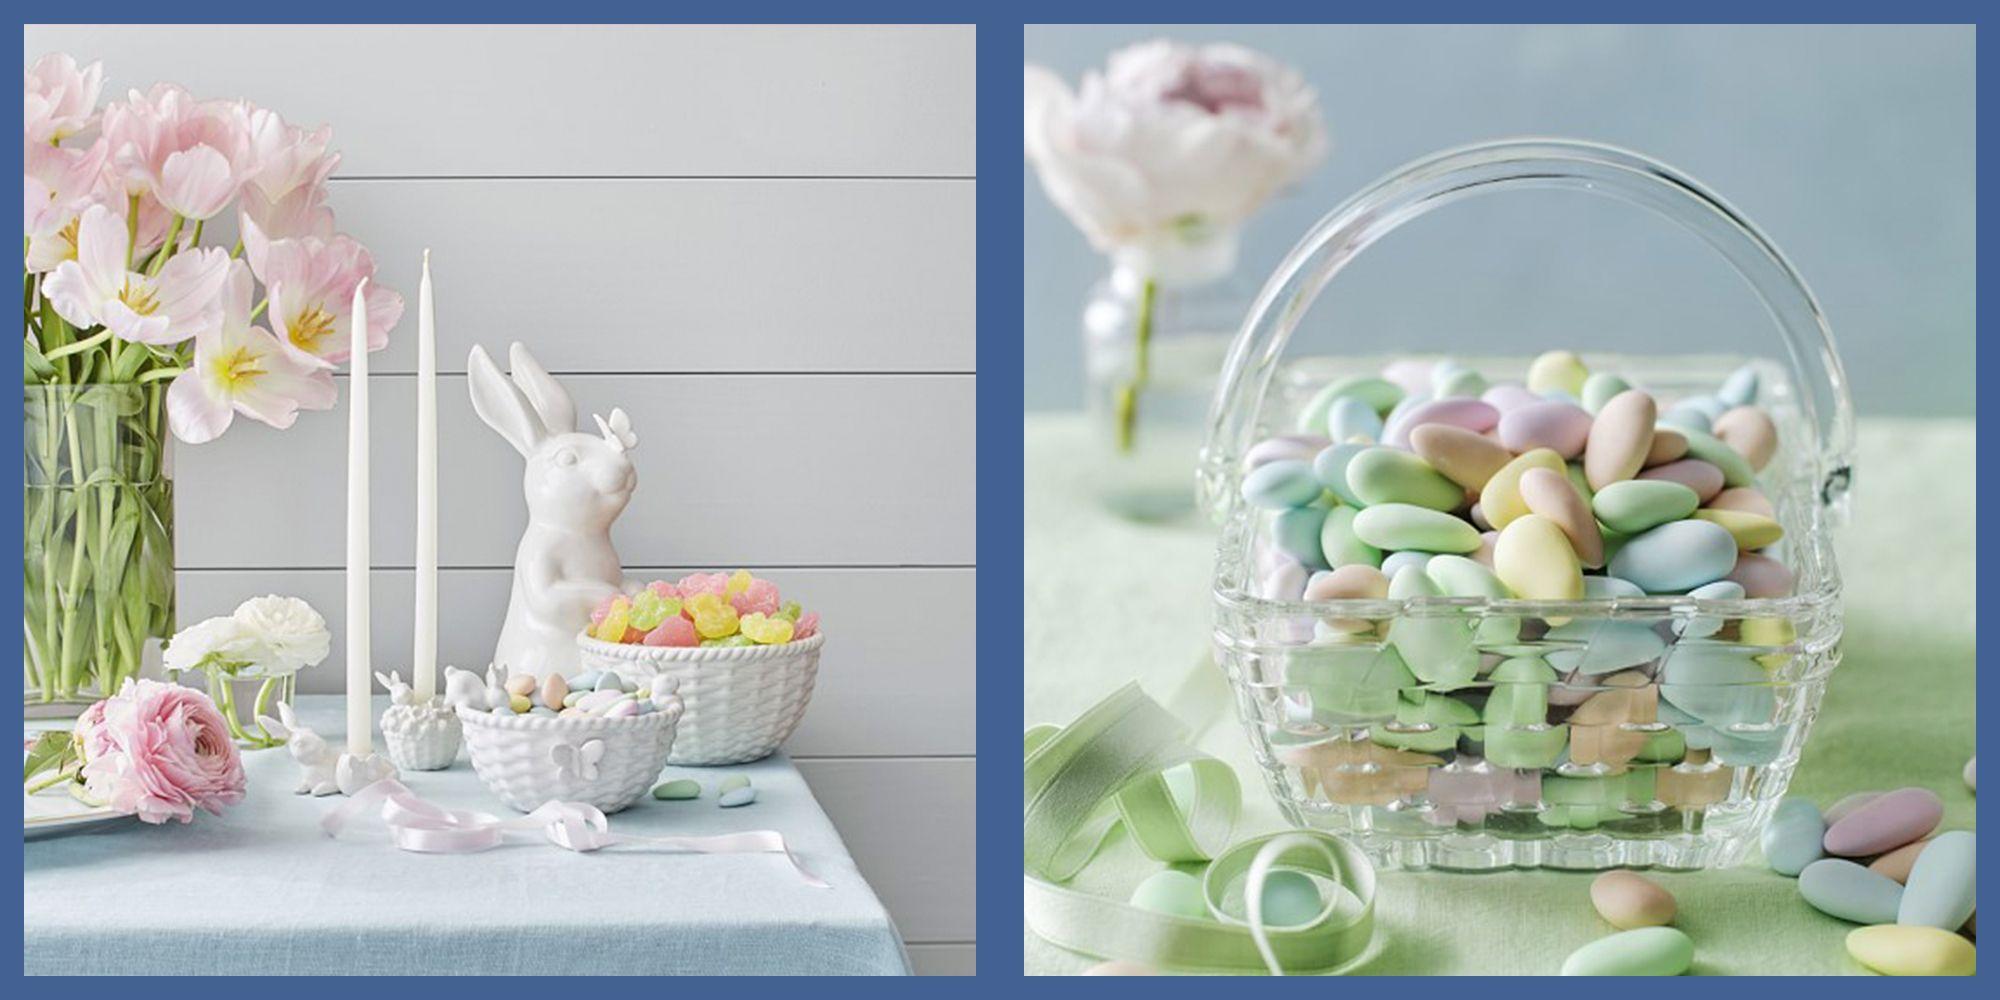 35 Elegant Easter Decorations 2021 Best Easter Home Decor Ideas